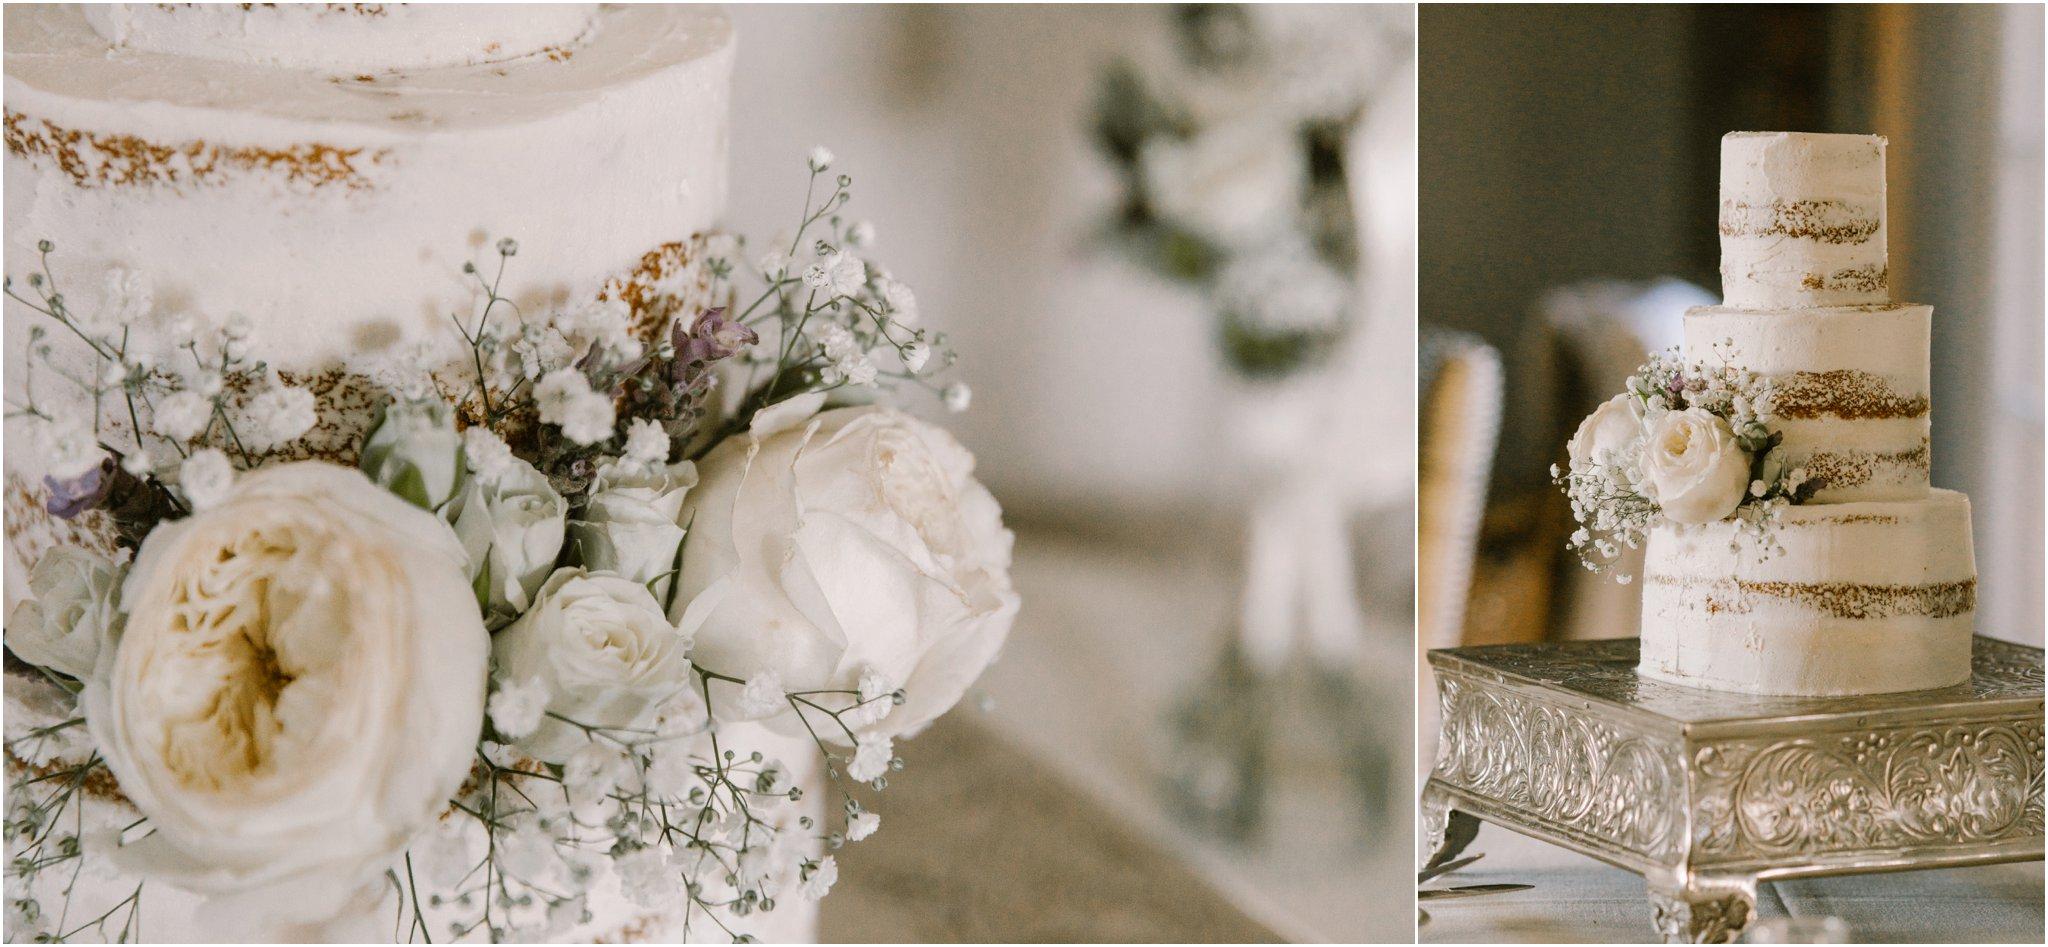 0019Blue Rose Photography_ Inn and Spa at Loretto Wedding_ Albuquerque and Santa Fe Wedding Photographer_ New Mexico Wedding Photography